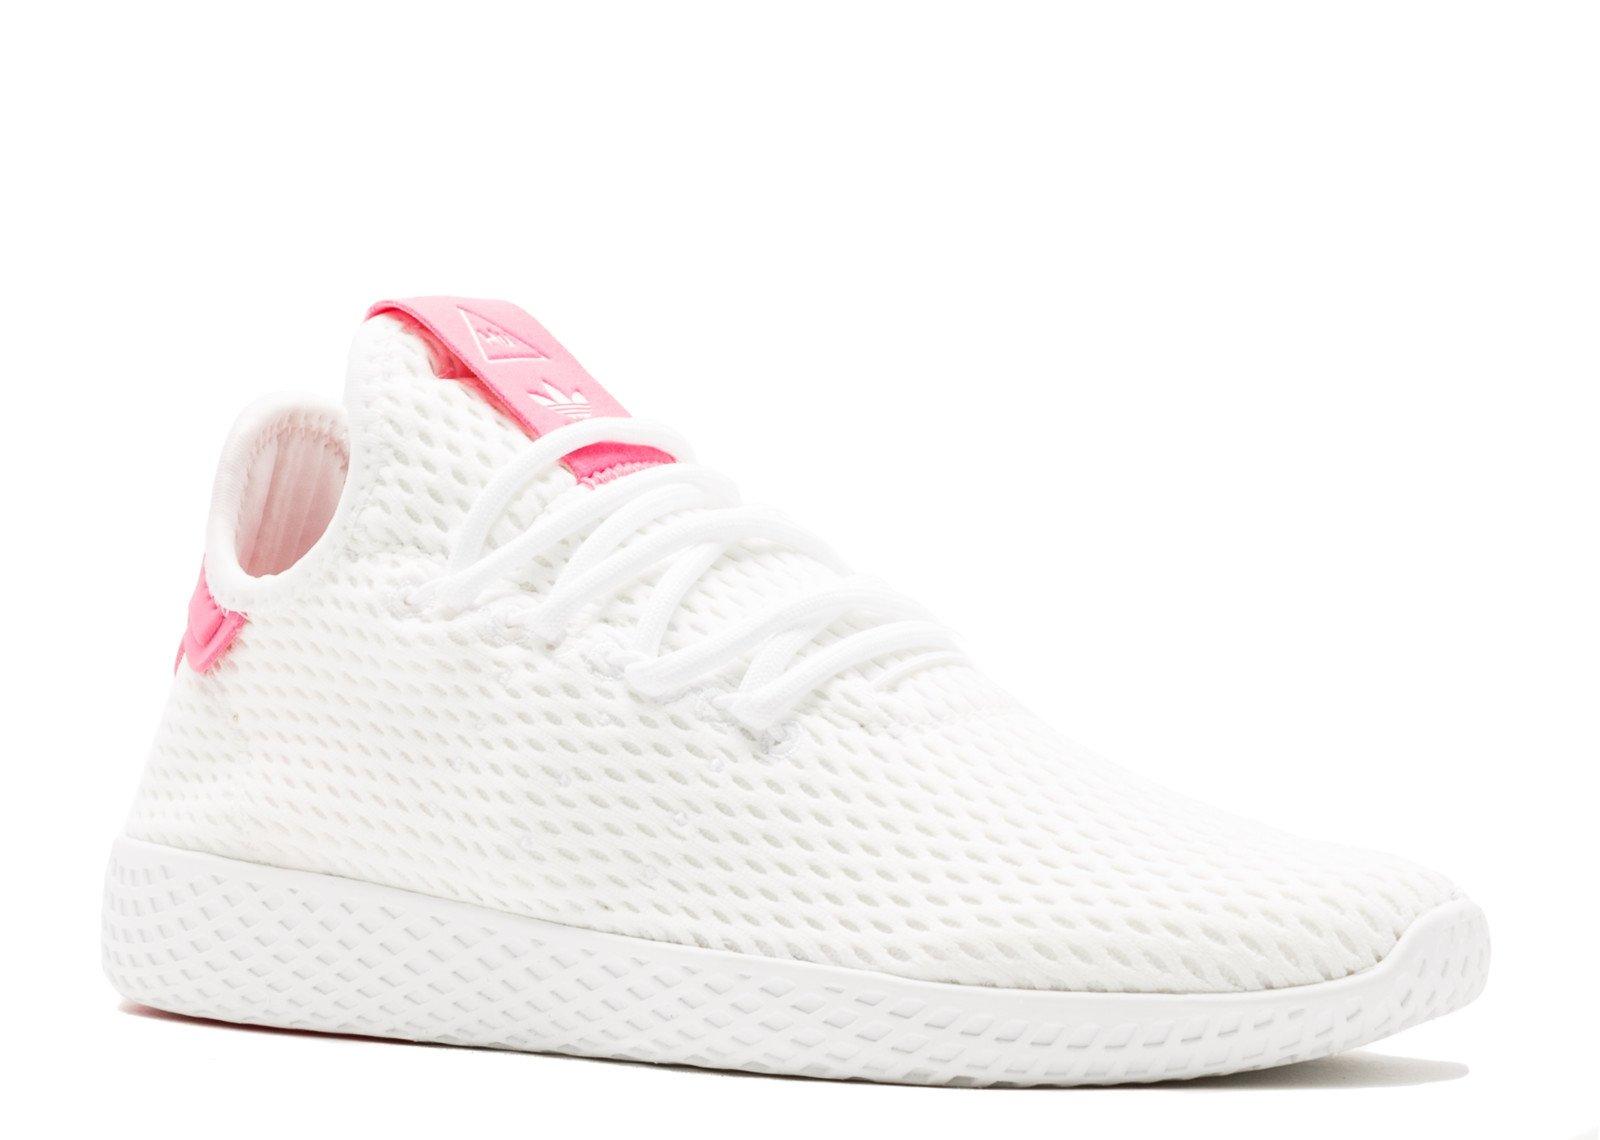 sneakers for cheap 9901e ed527 Galleon - Adidas Mens Pw Tennis Hu Sneaker (11.5 D(M) US, White Semi Solar  Pink)